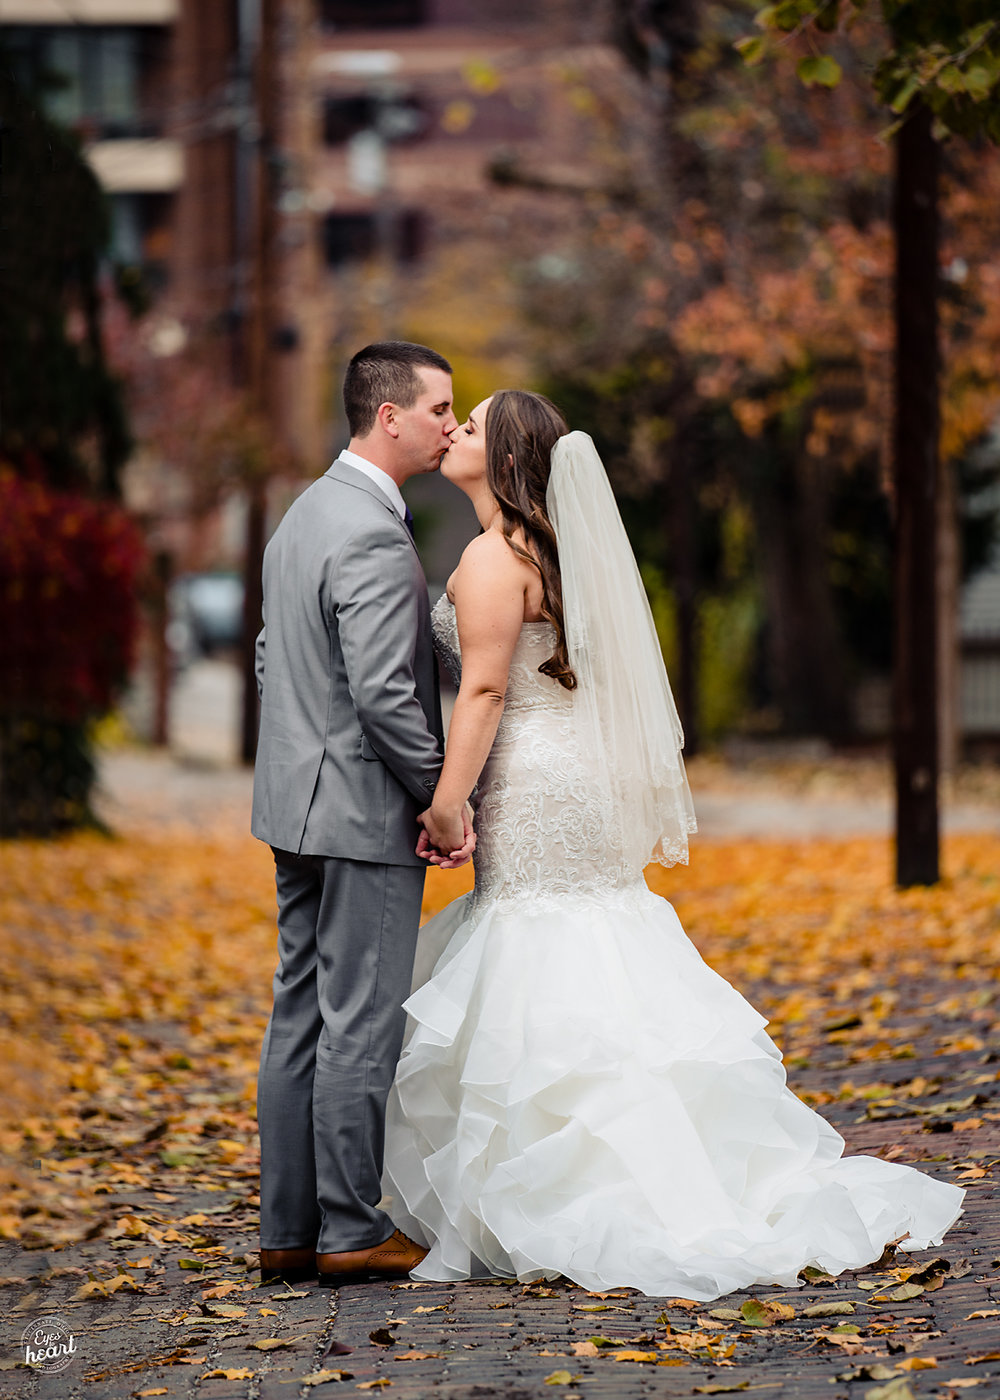 The-Pinnacle-Ballroom-Covington-KY-Wedding-Photography-9.jpg